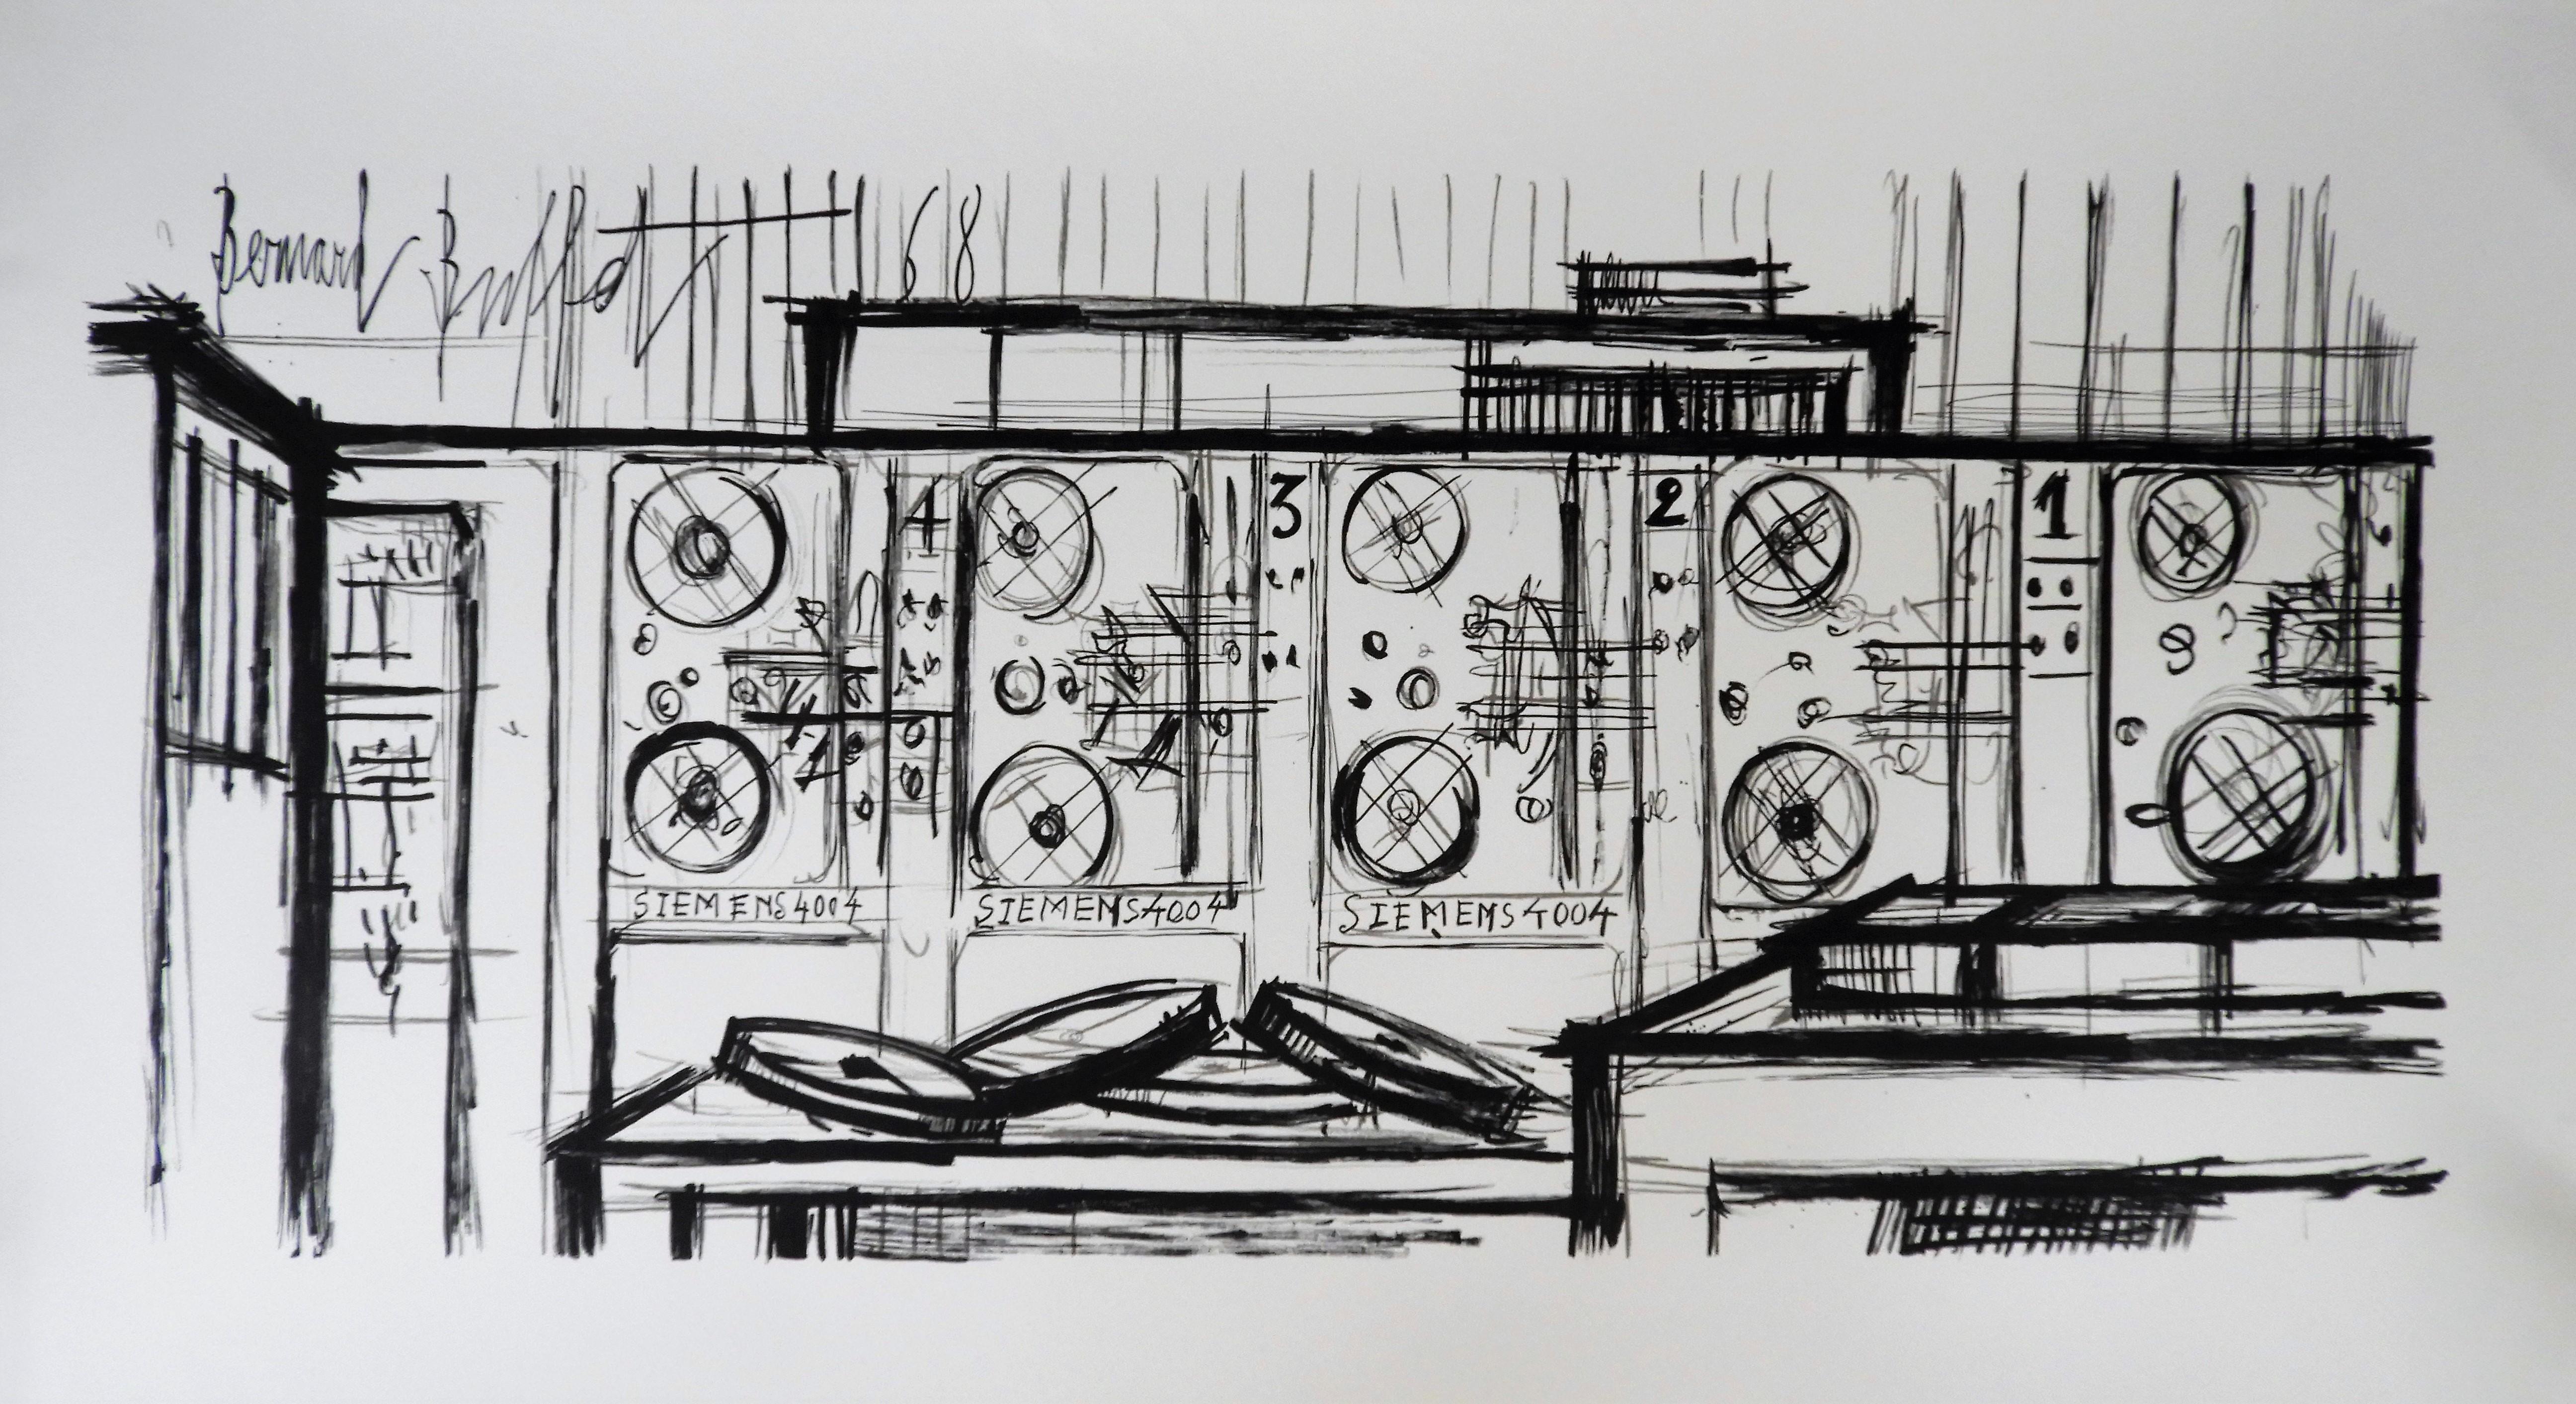 Siemens 06